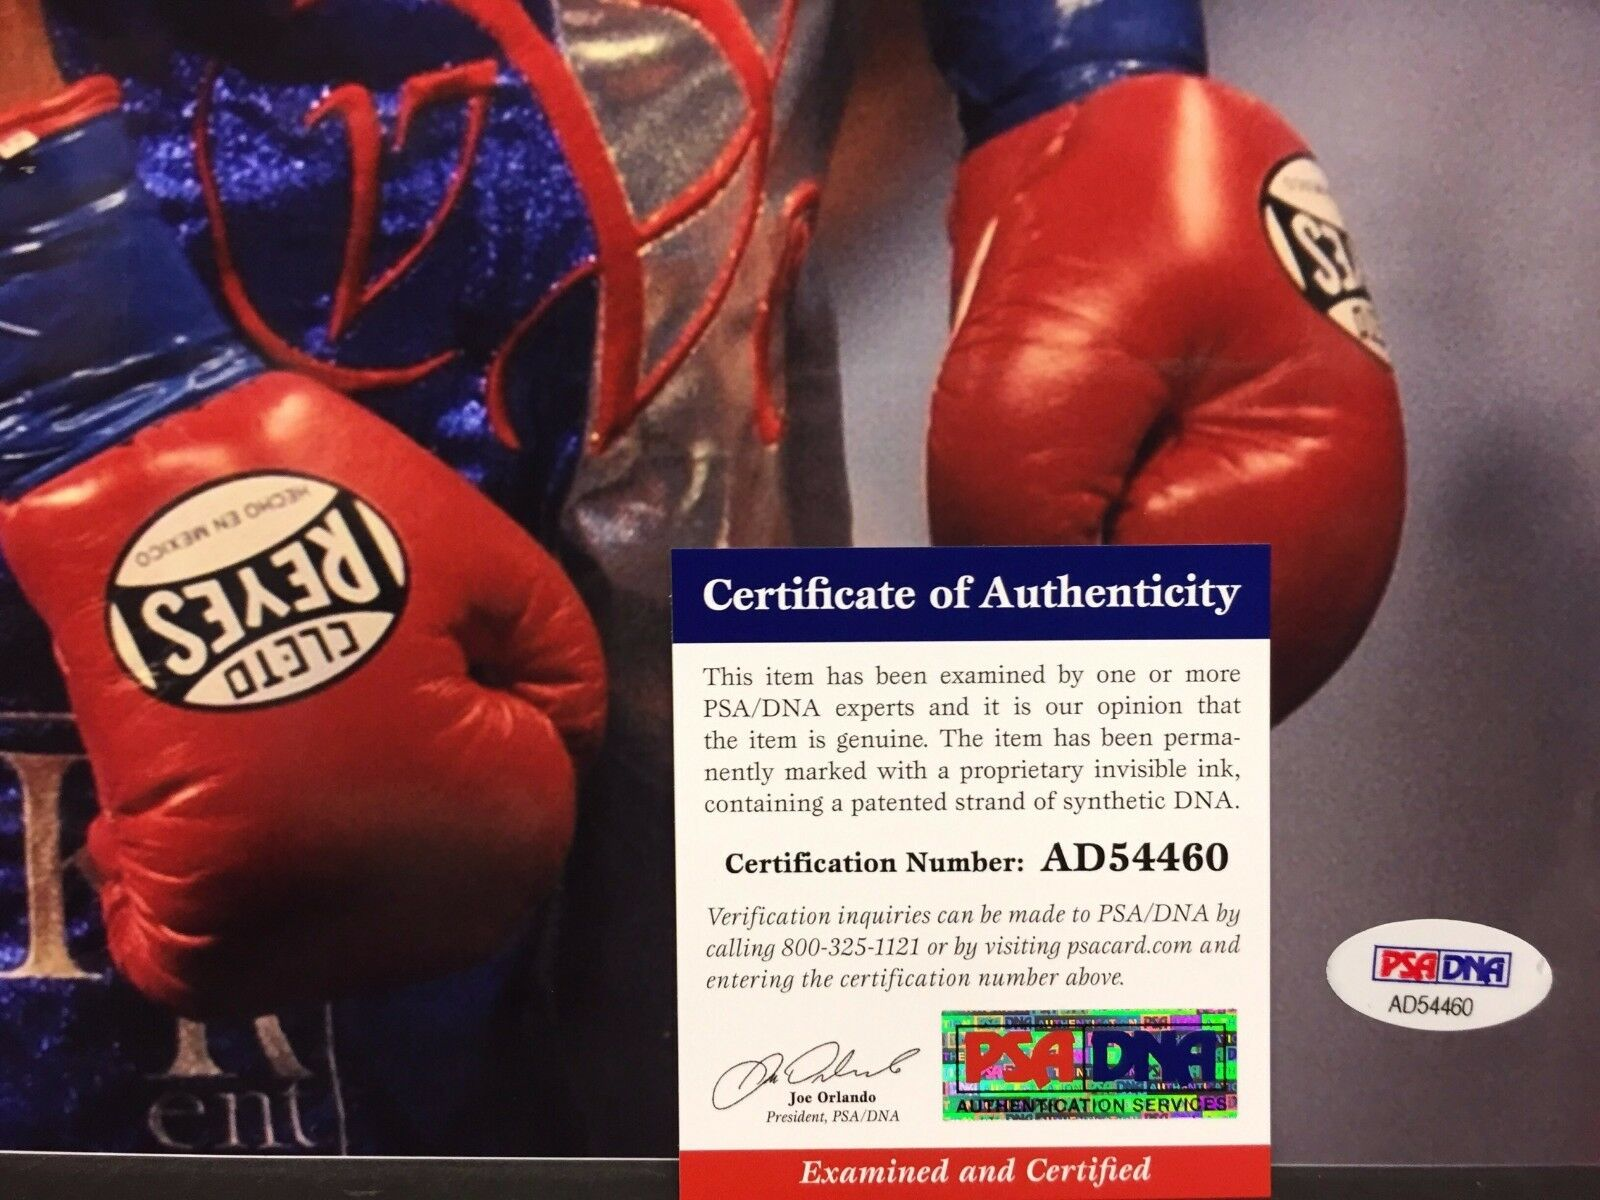 Victor Ortiz Signed 12x18 Boxing Photo *Cleto Reyes PSA AD54460